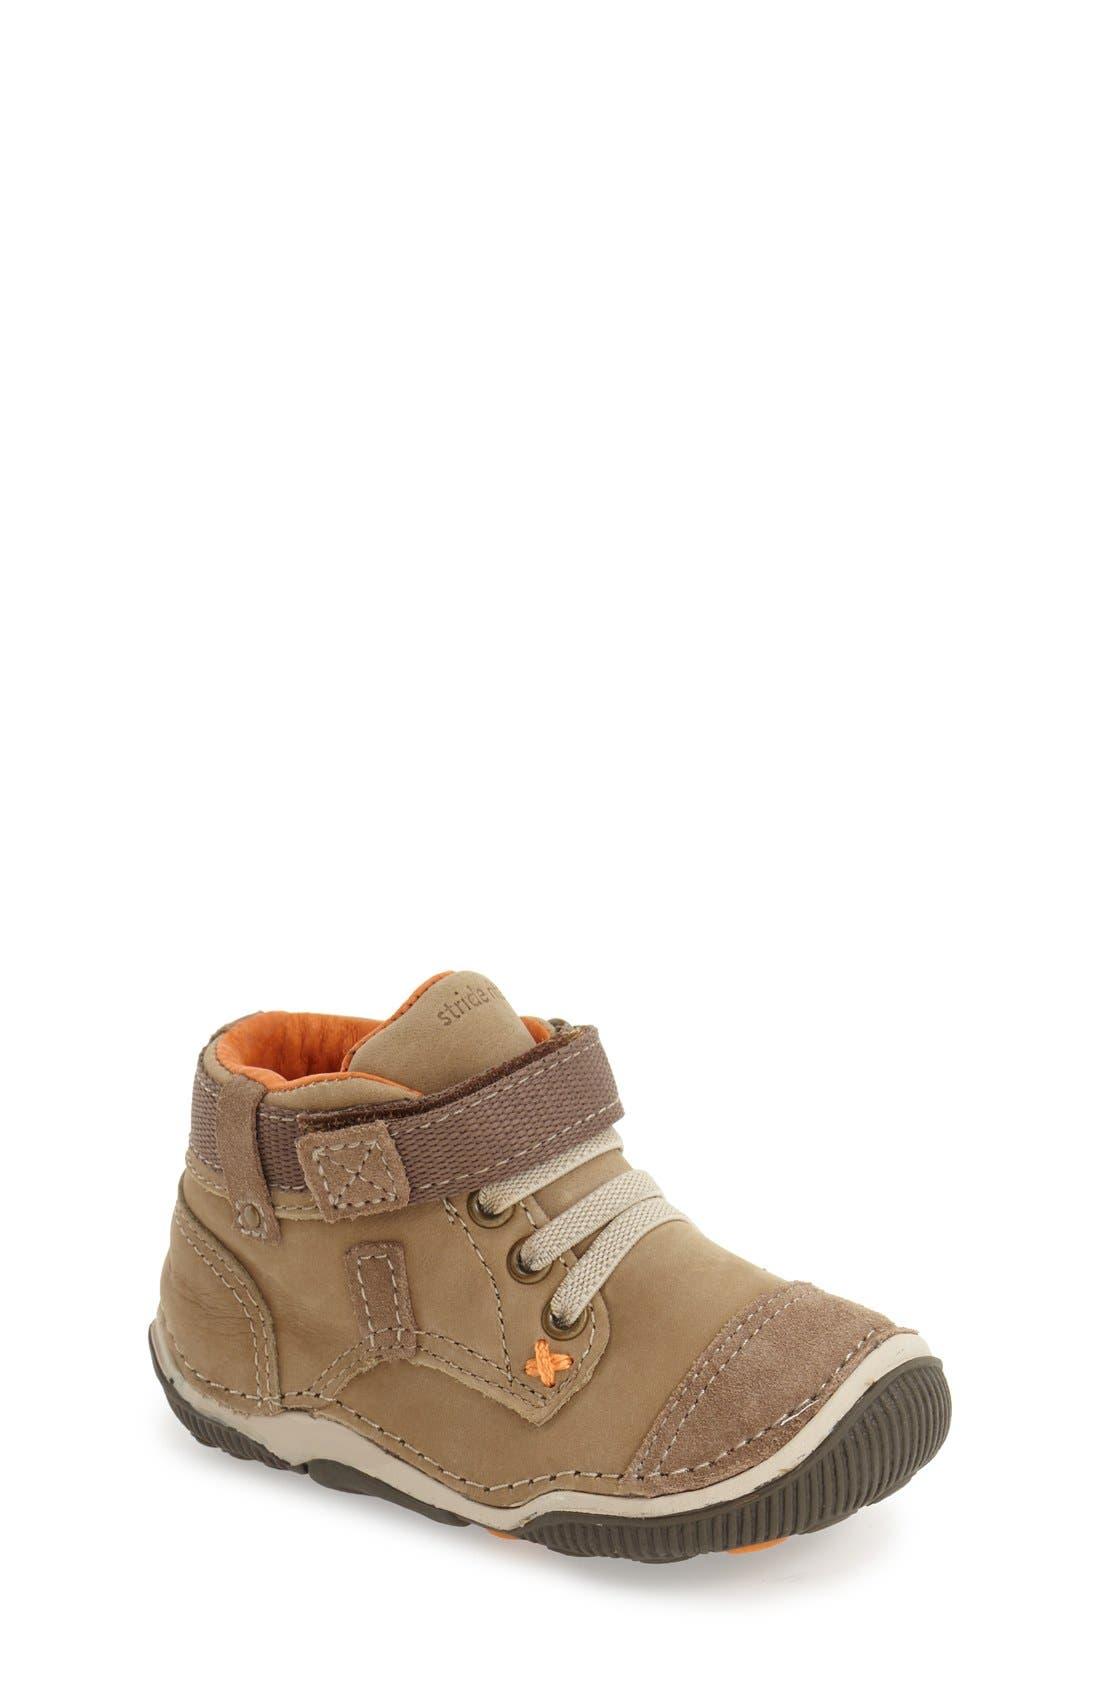 Stride Rite Baby \u0026 Walker Boots | Nordstrom